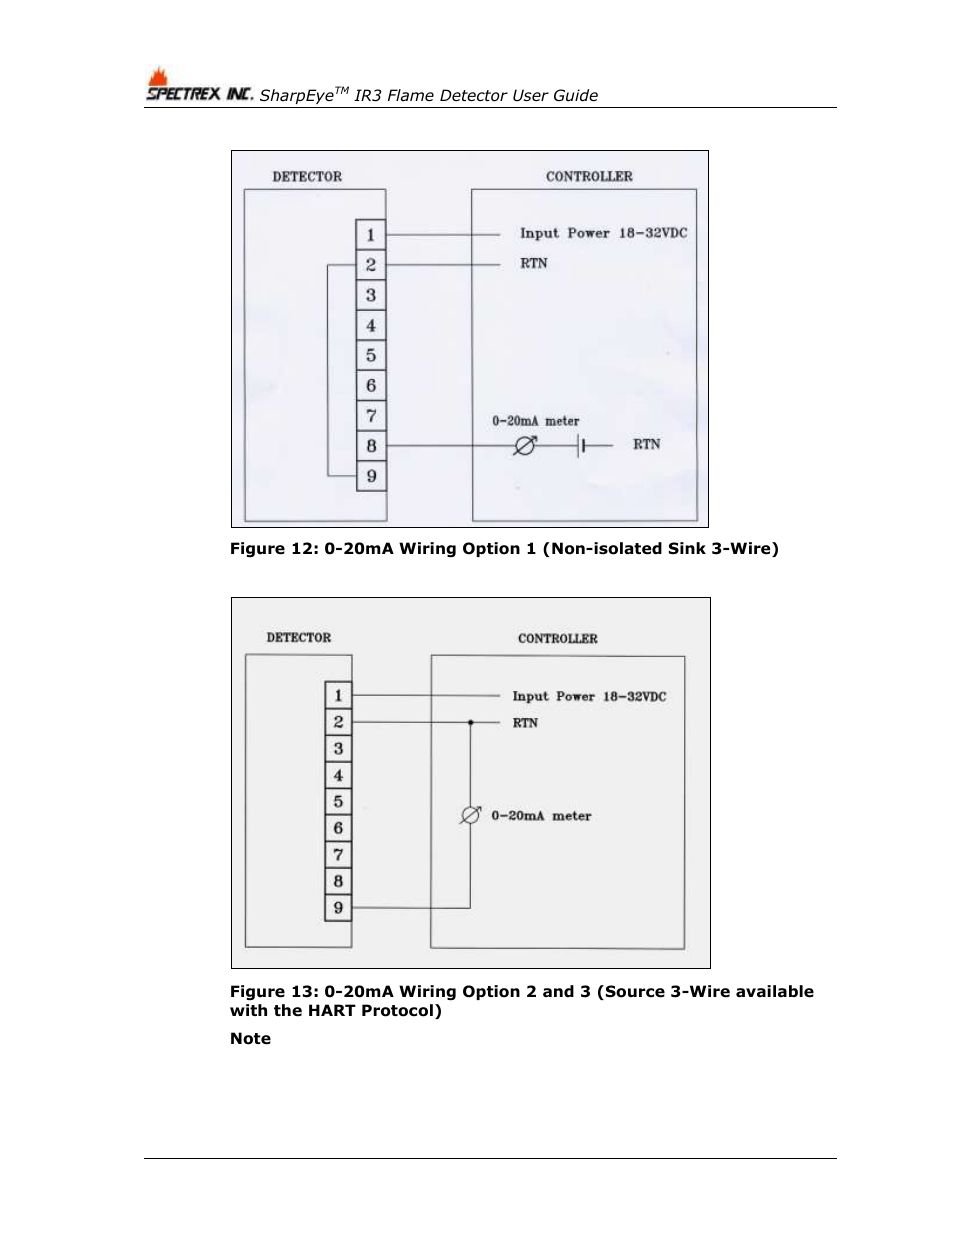 hight resolution of figure 12 figure 13 spectrex 40 40i triple ir ir3 flame detector user manual page 66 80